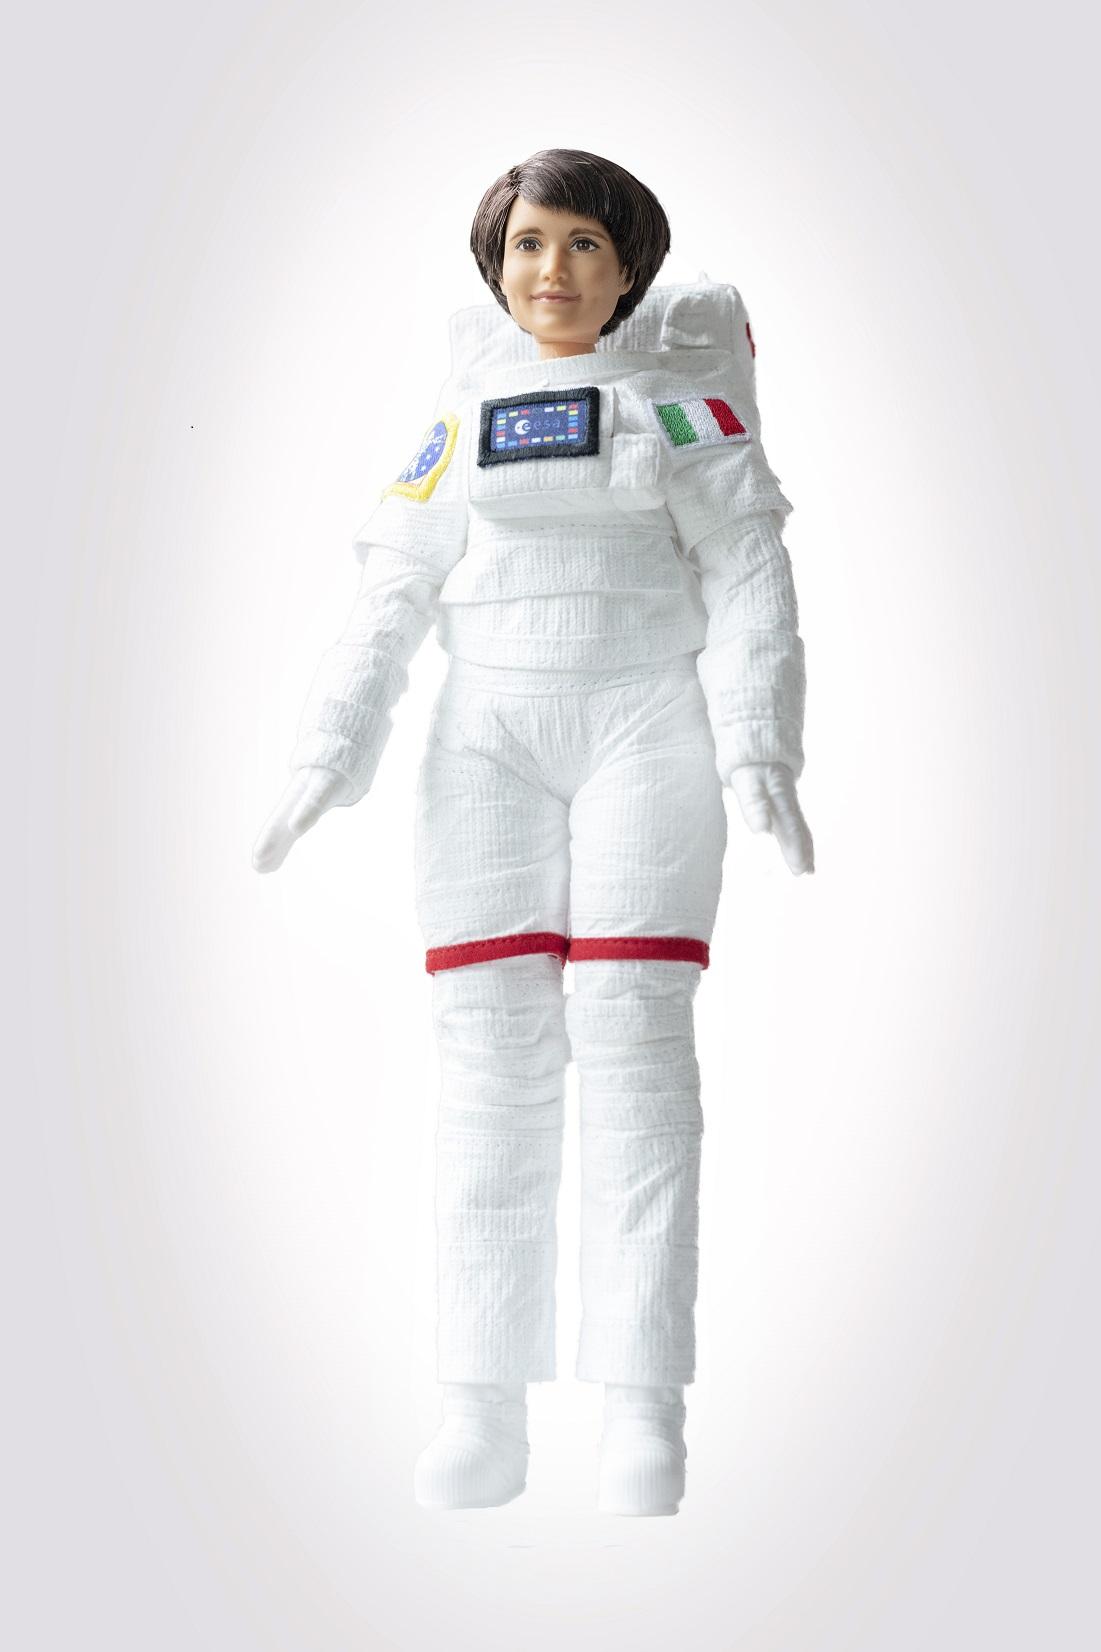 La Barbie ispirata all'astronauta Samantha Cristoforetti